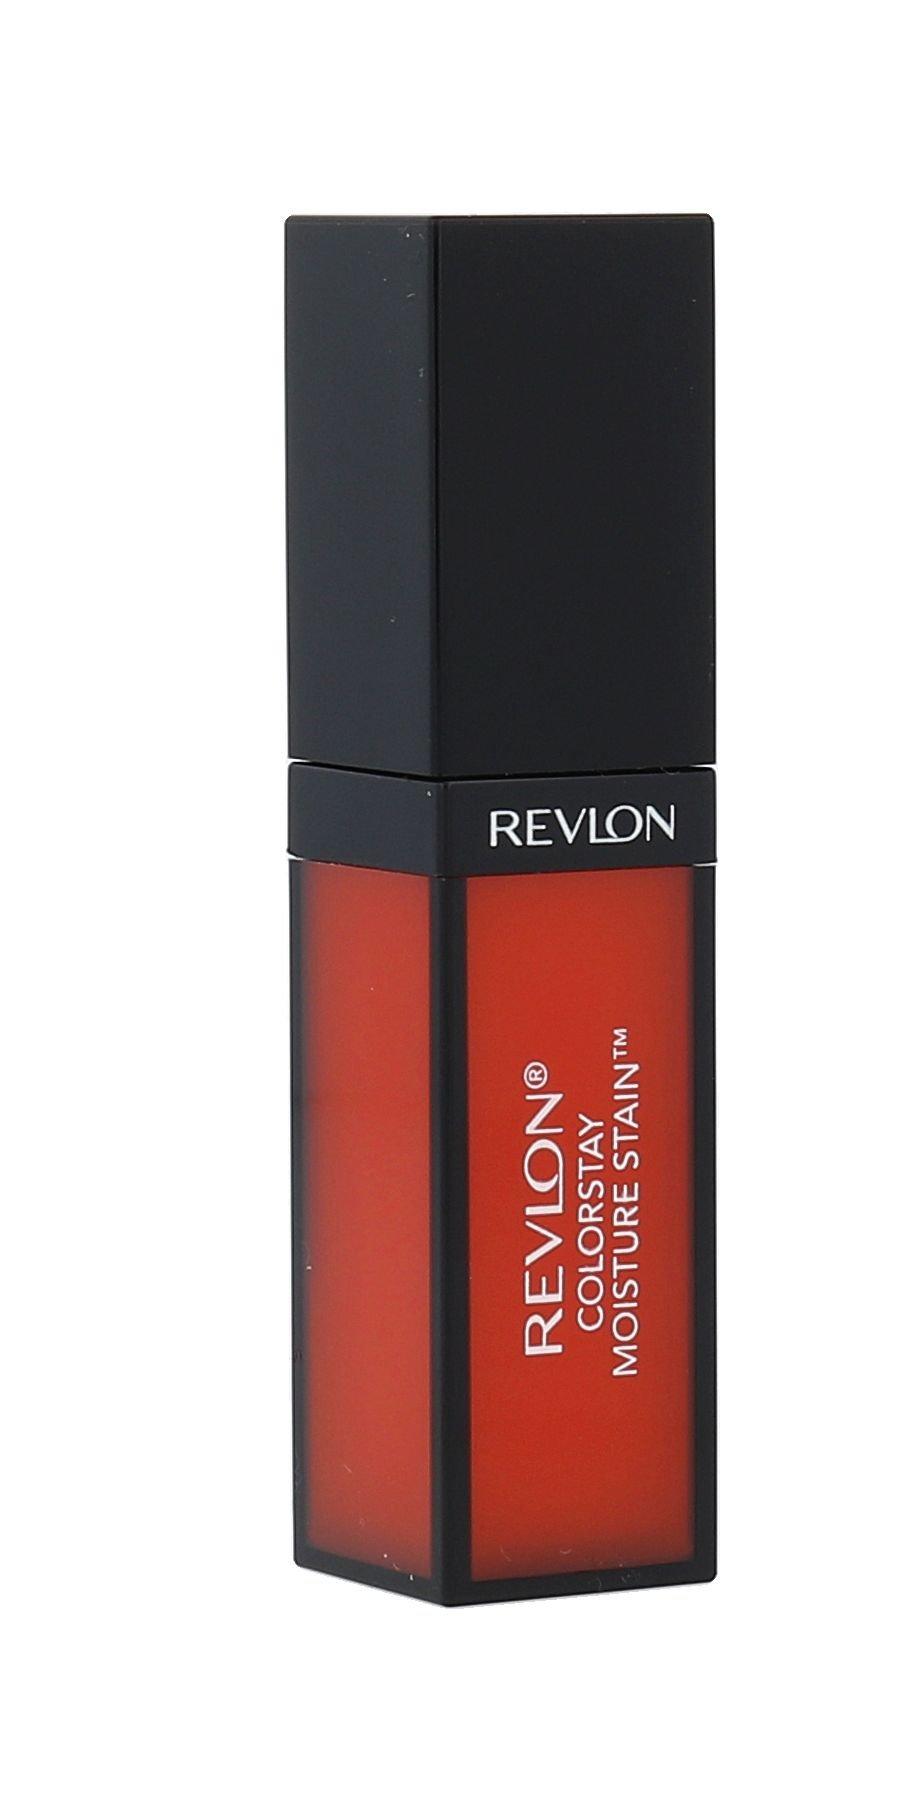 Revlon Colorstay Cosmetic 8ml 030 Milan Moment